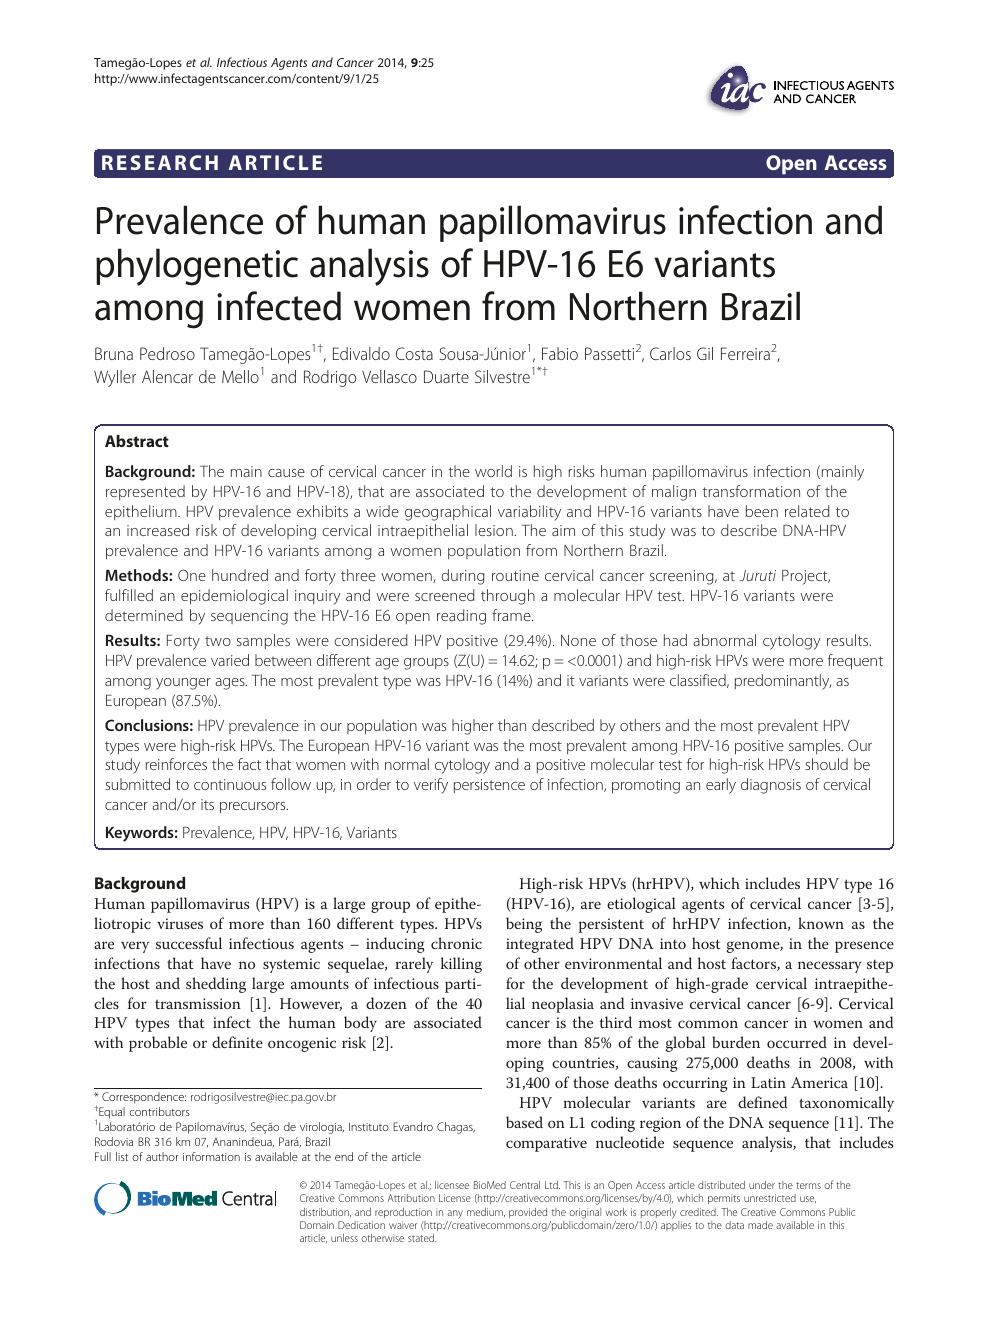 papillomavirus infection definition detoxifiere natur house